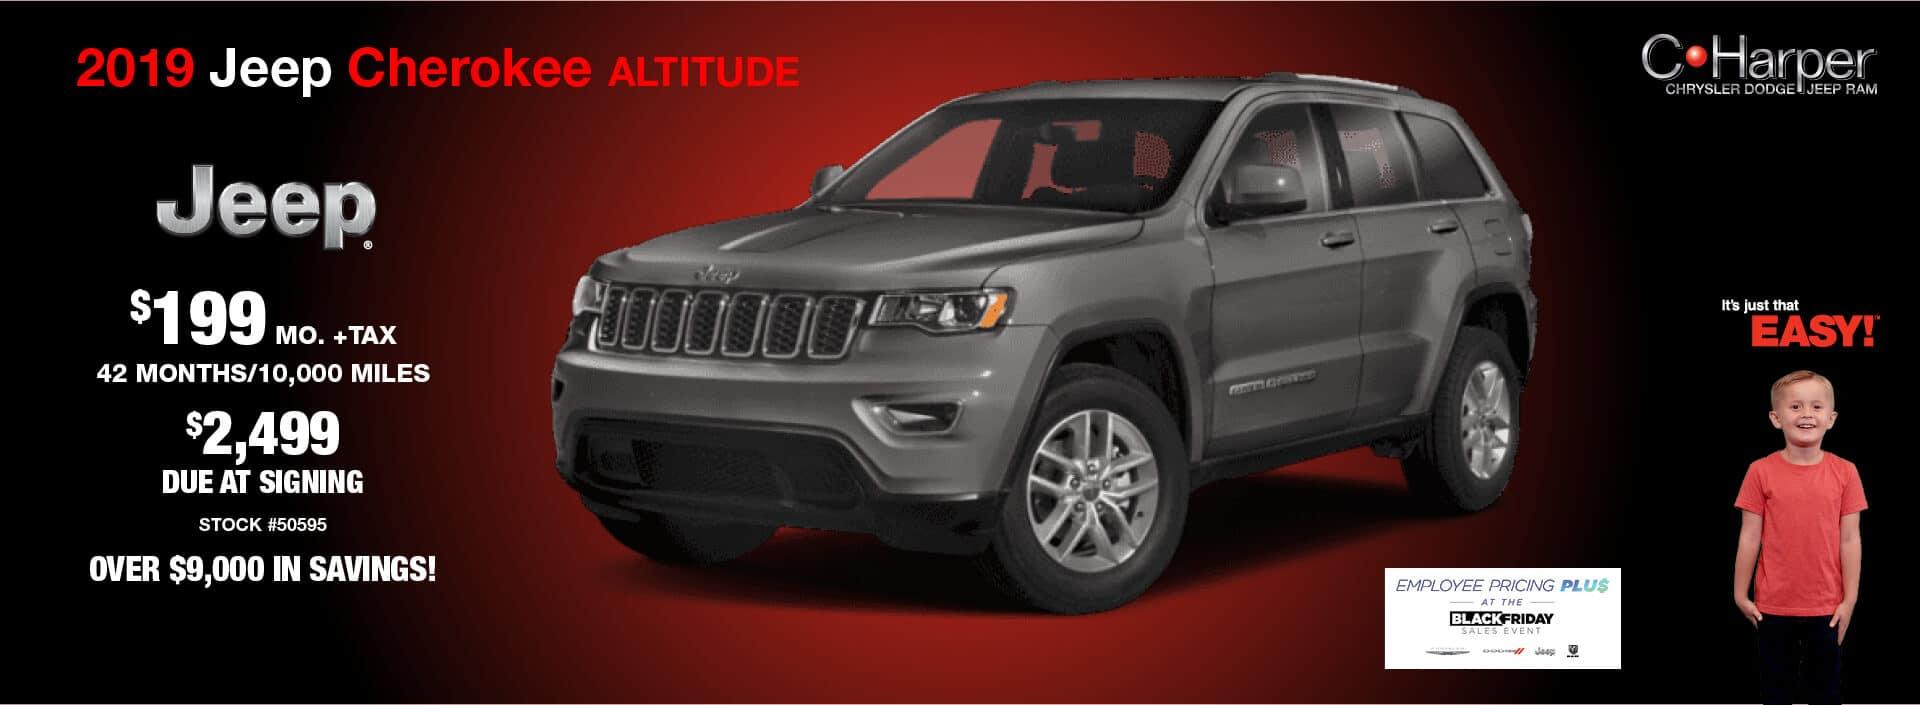 2019 Jeep Cherokee (Altitude)